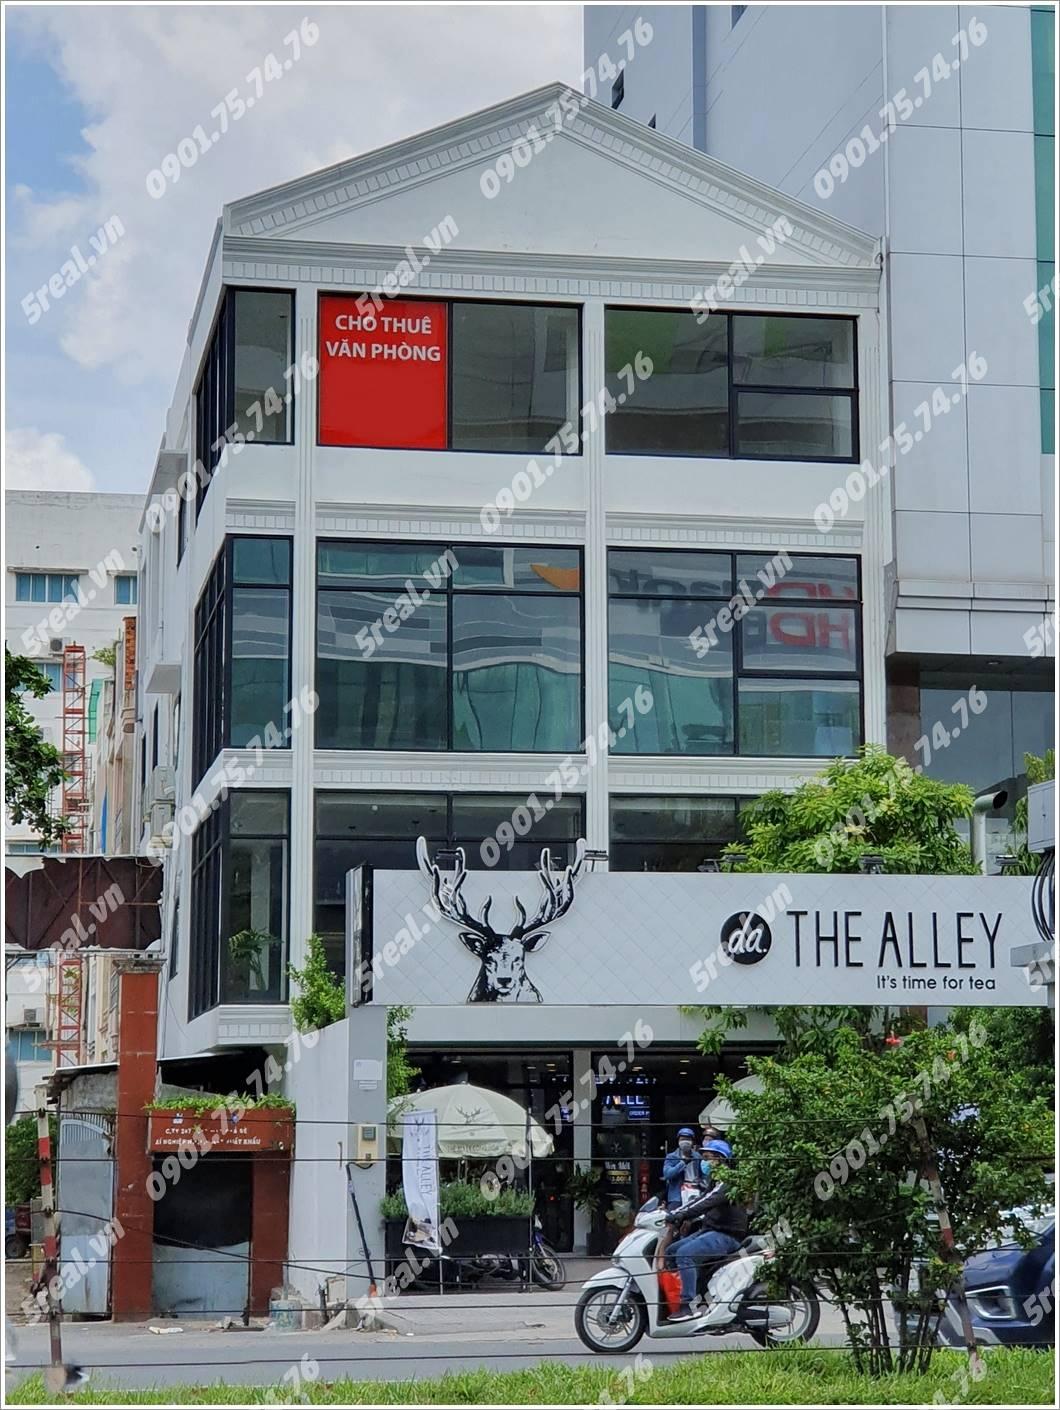 alley-building-cong-hoa-quan-tan-binh-van-phong-cho-thue-5real.vn-01